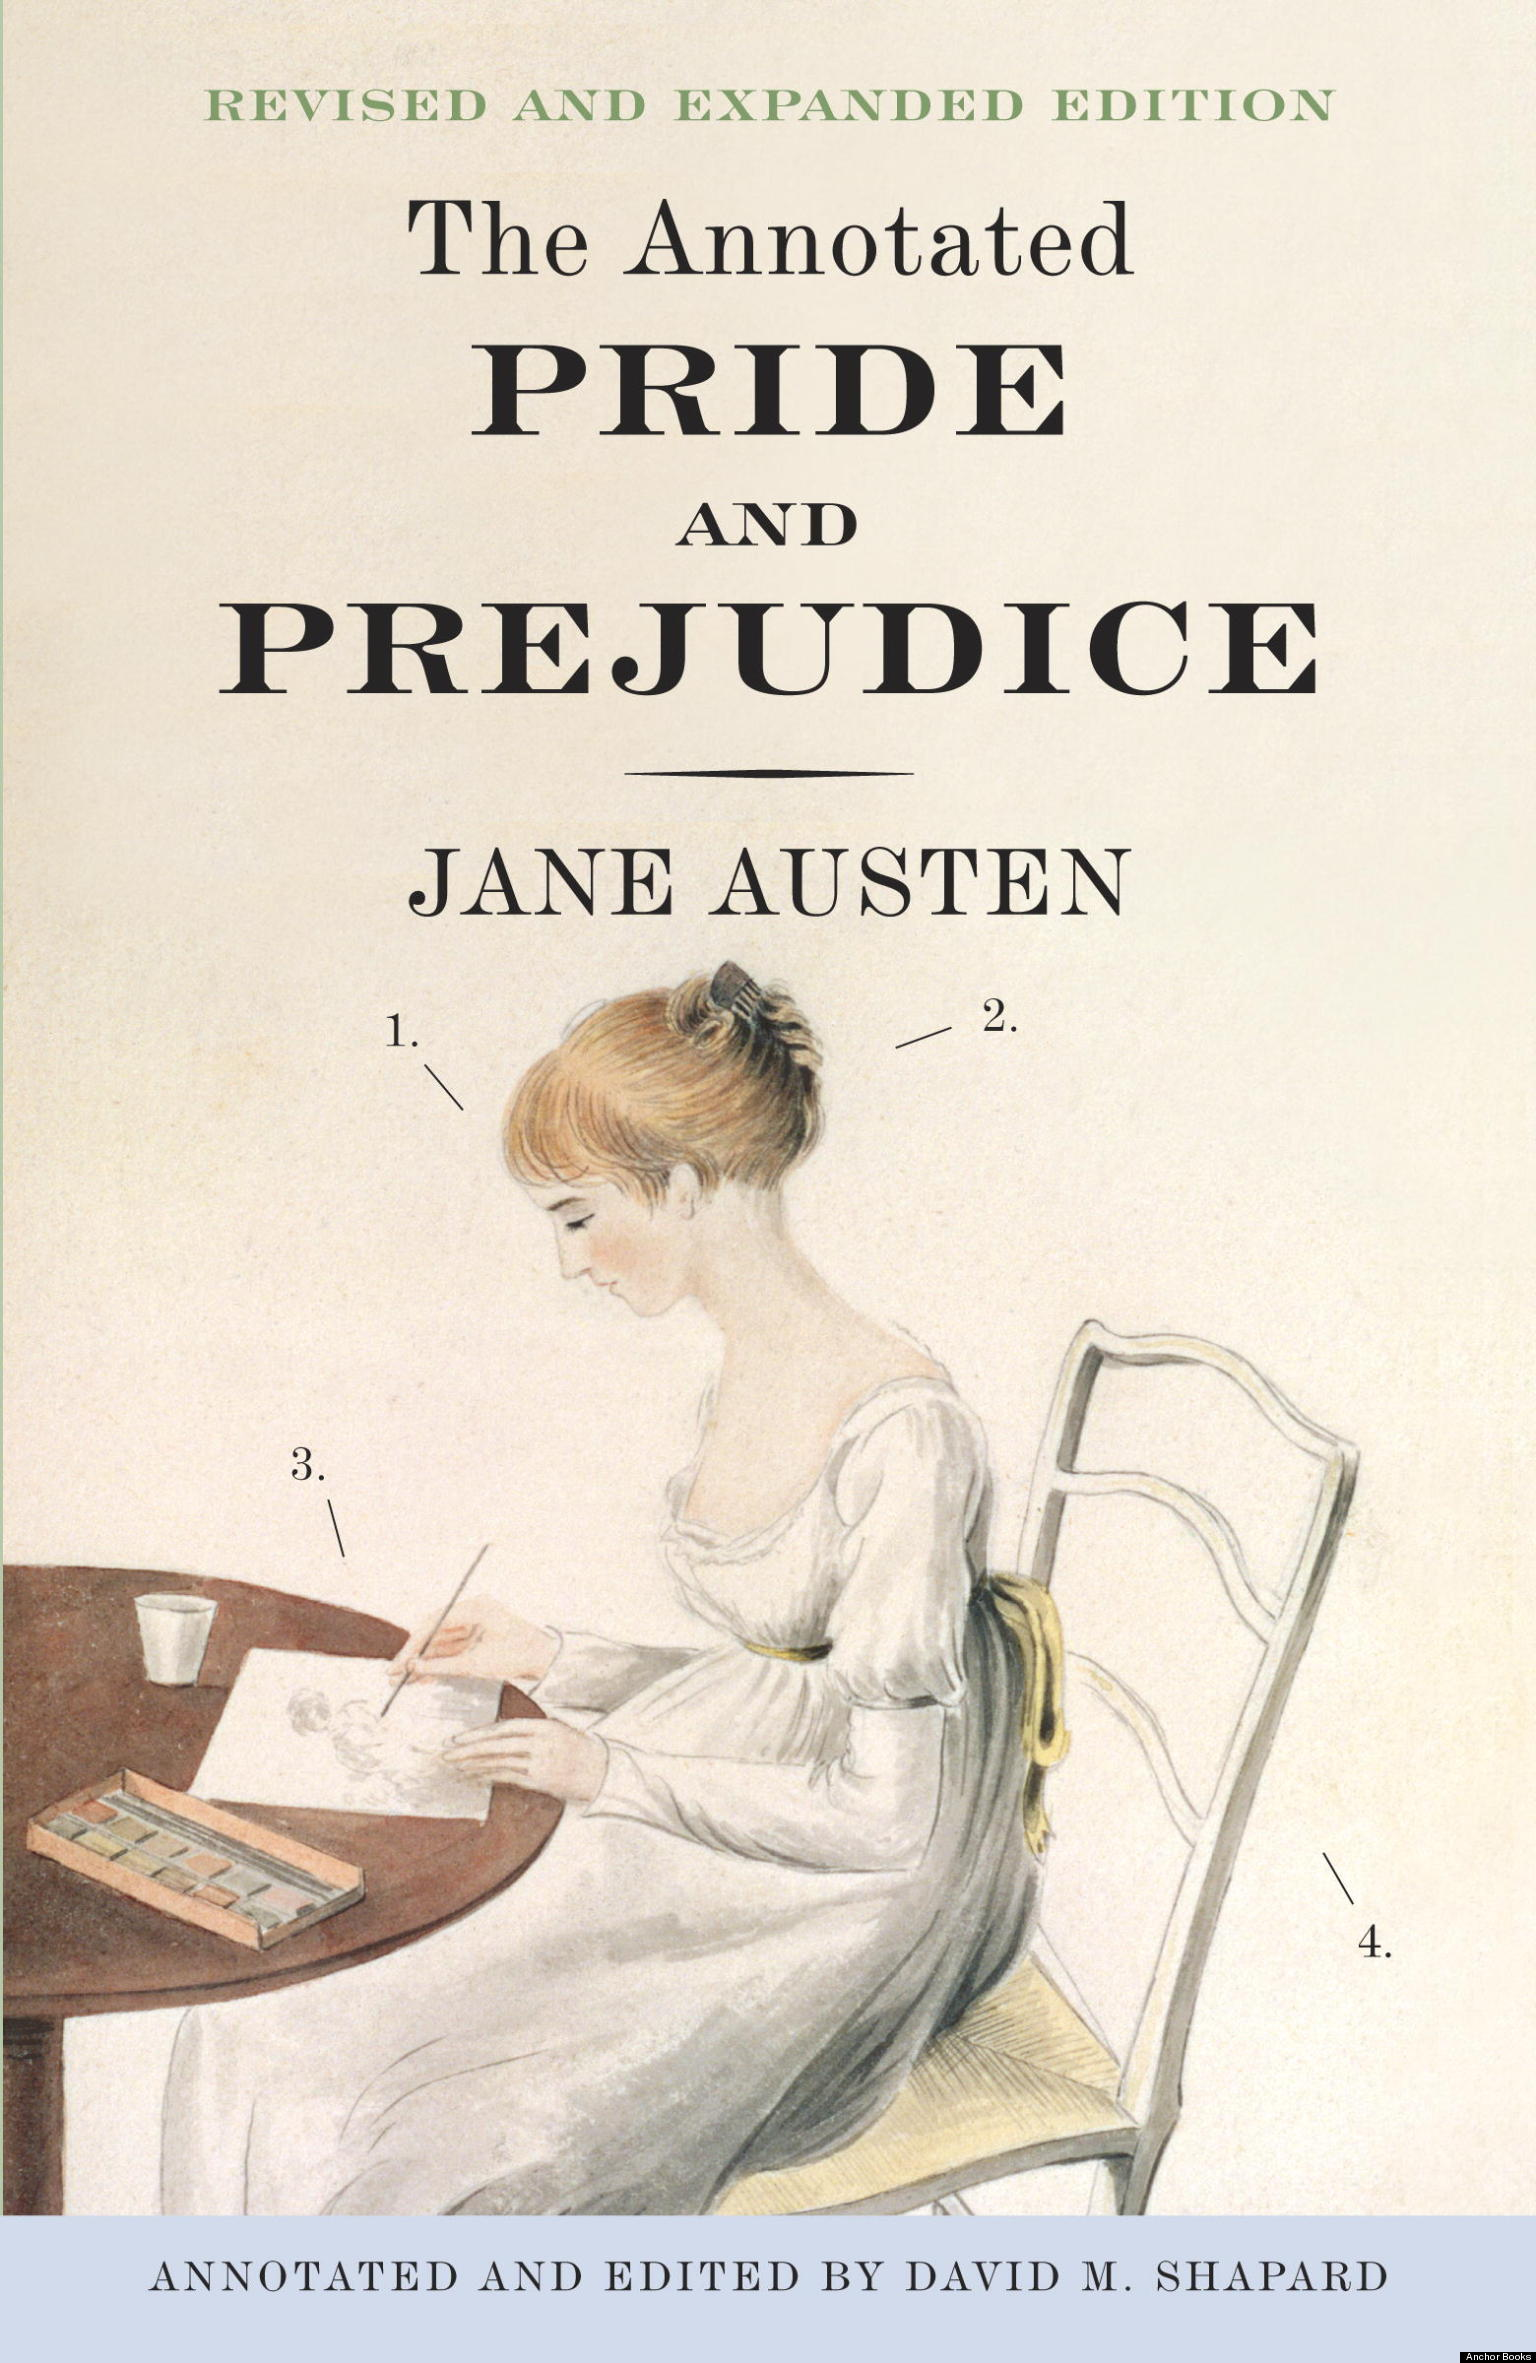 Pride and prejudice original book